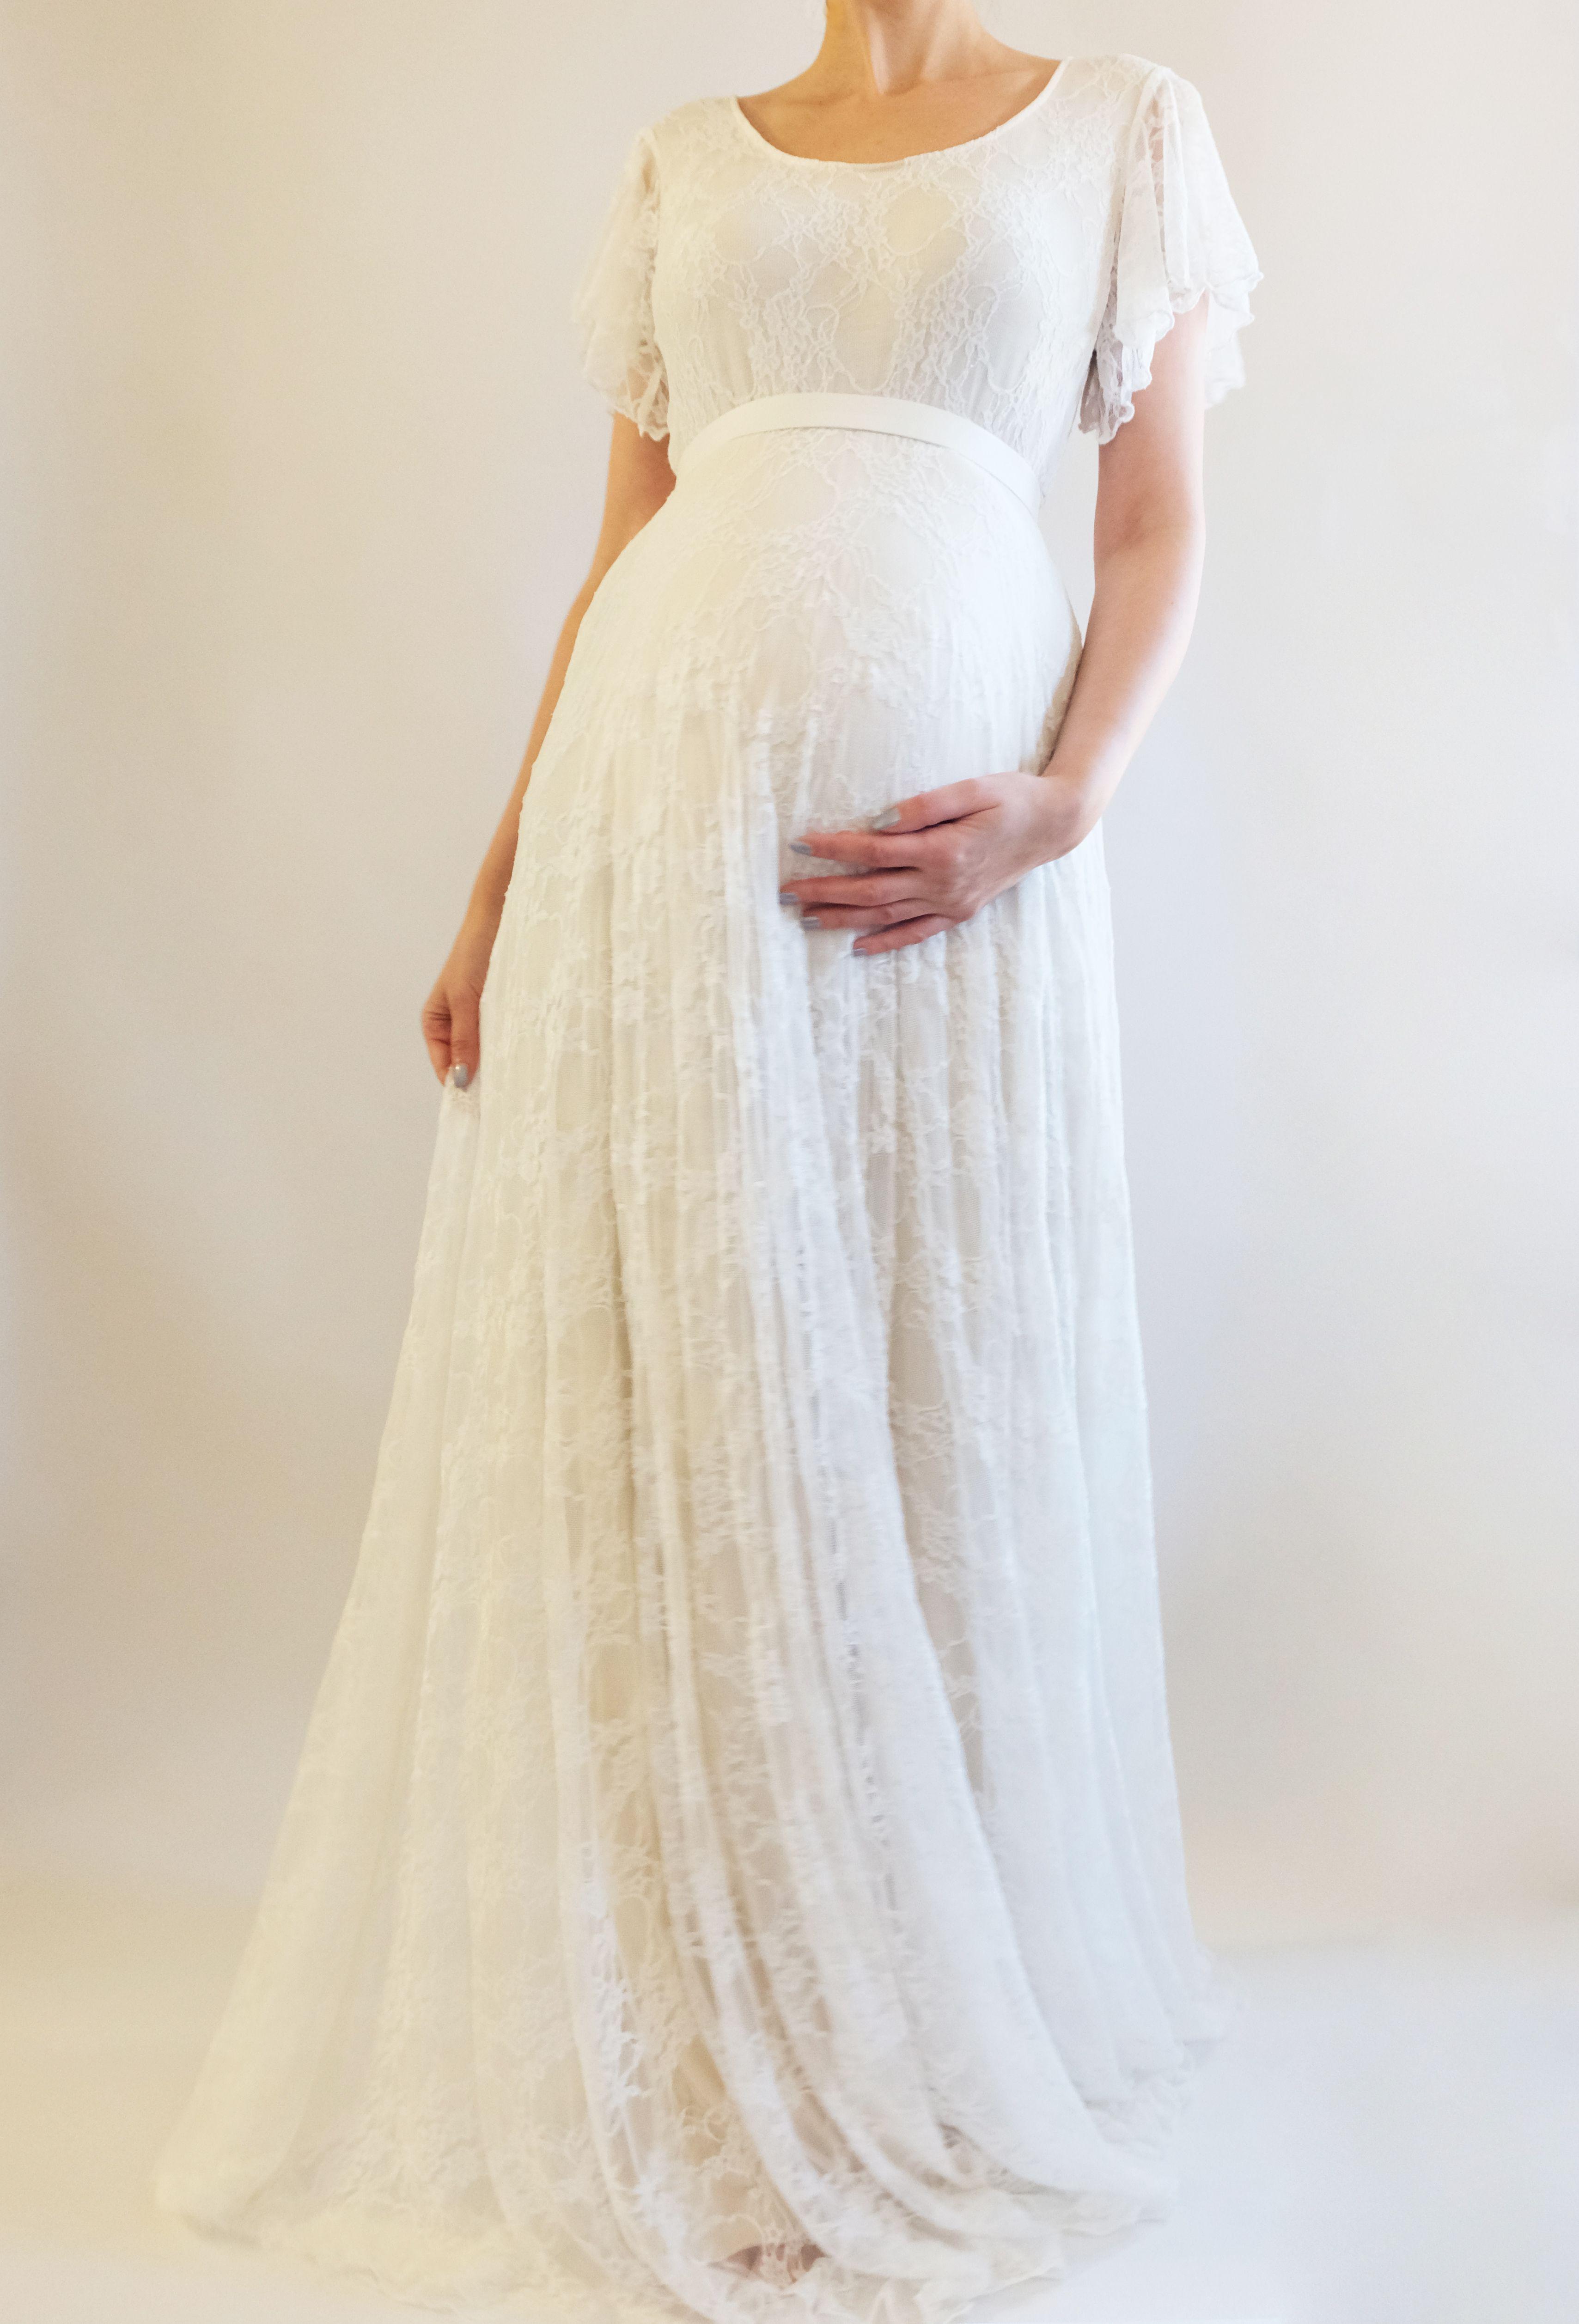 ALICE Boho Wedding Dress Lace Wedding Dress Maternity Dress Boho